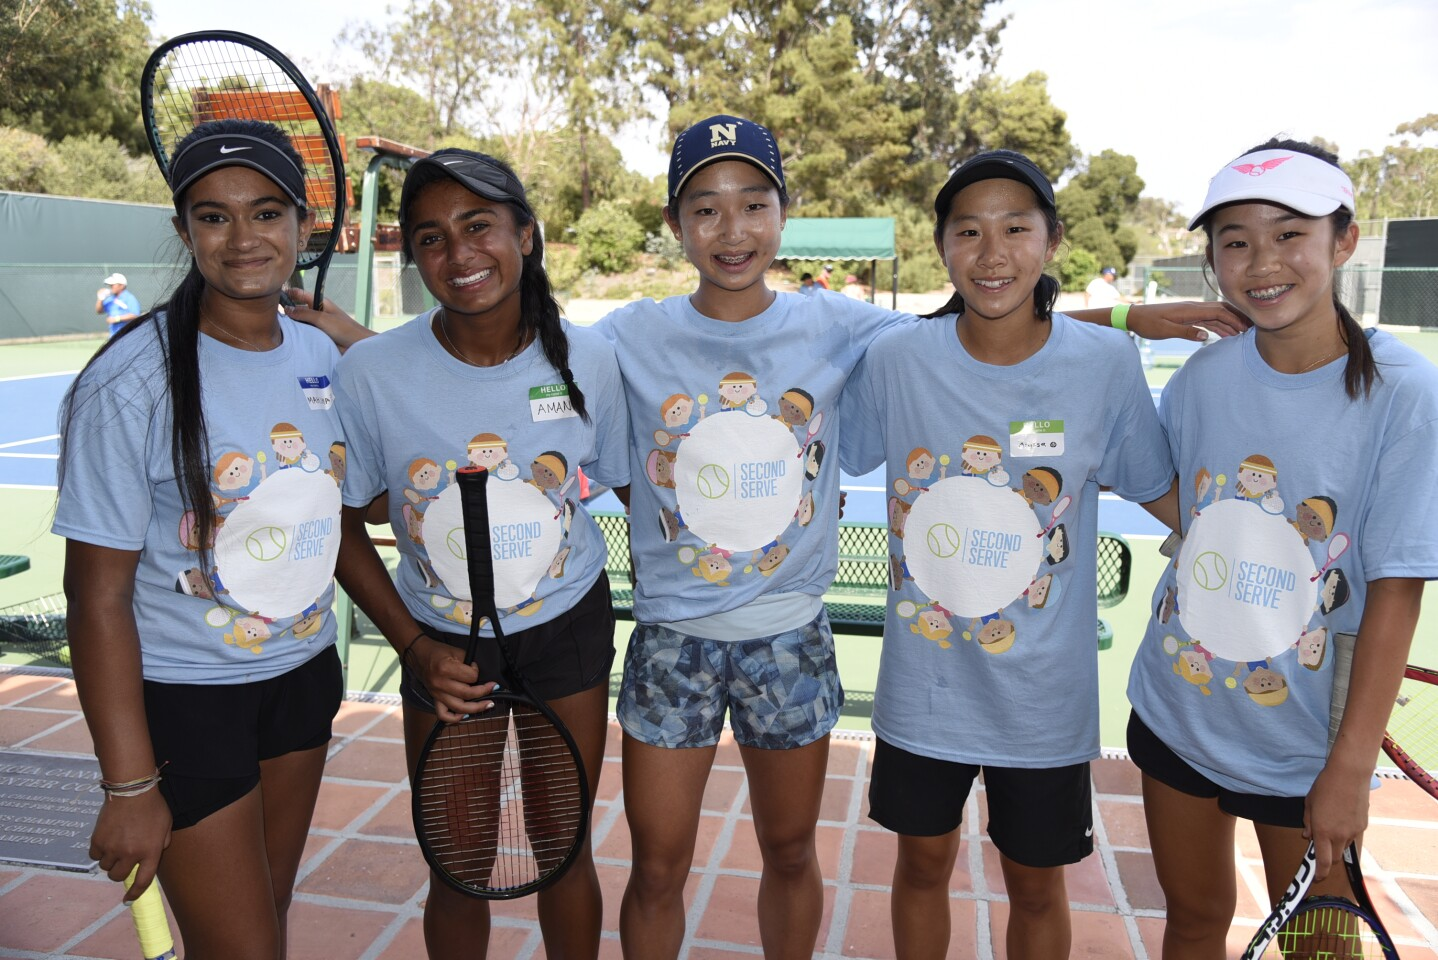 Mahima, Second Serve co-founder Amani Shah, Rachel, Alyssa, Ava